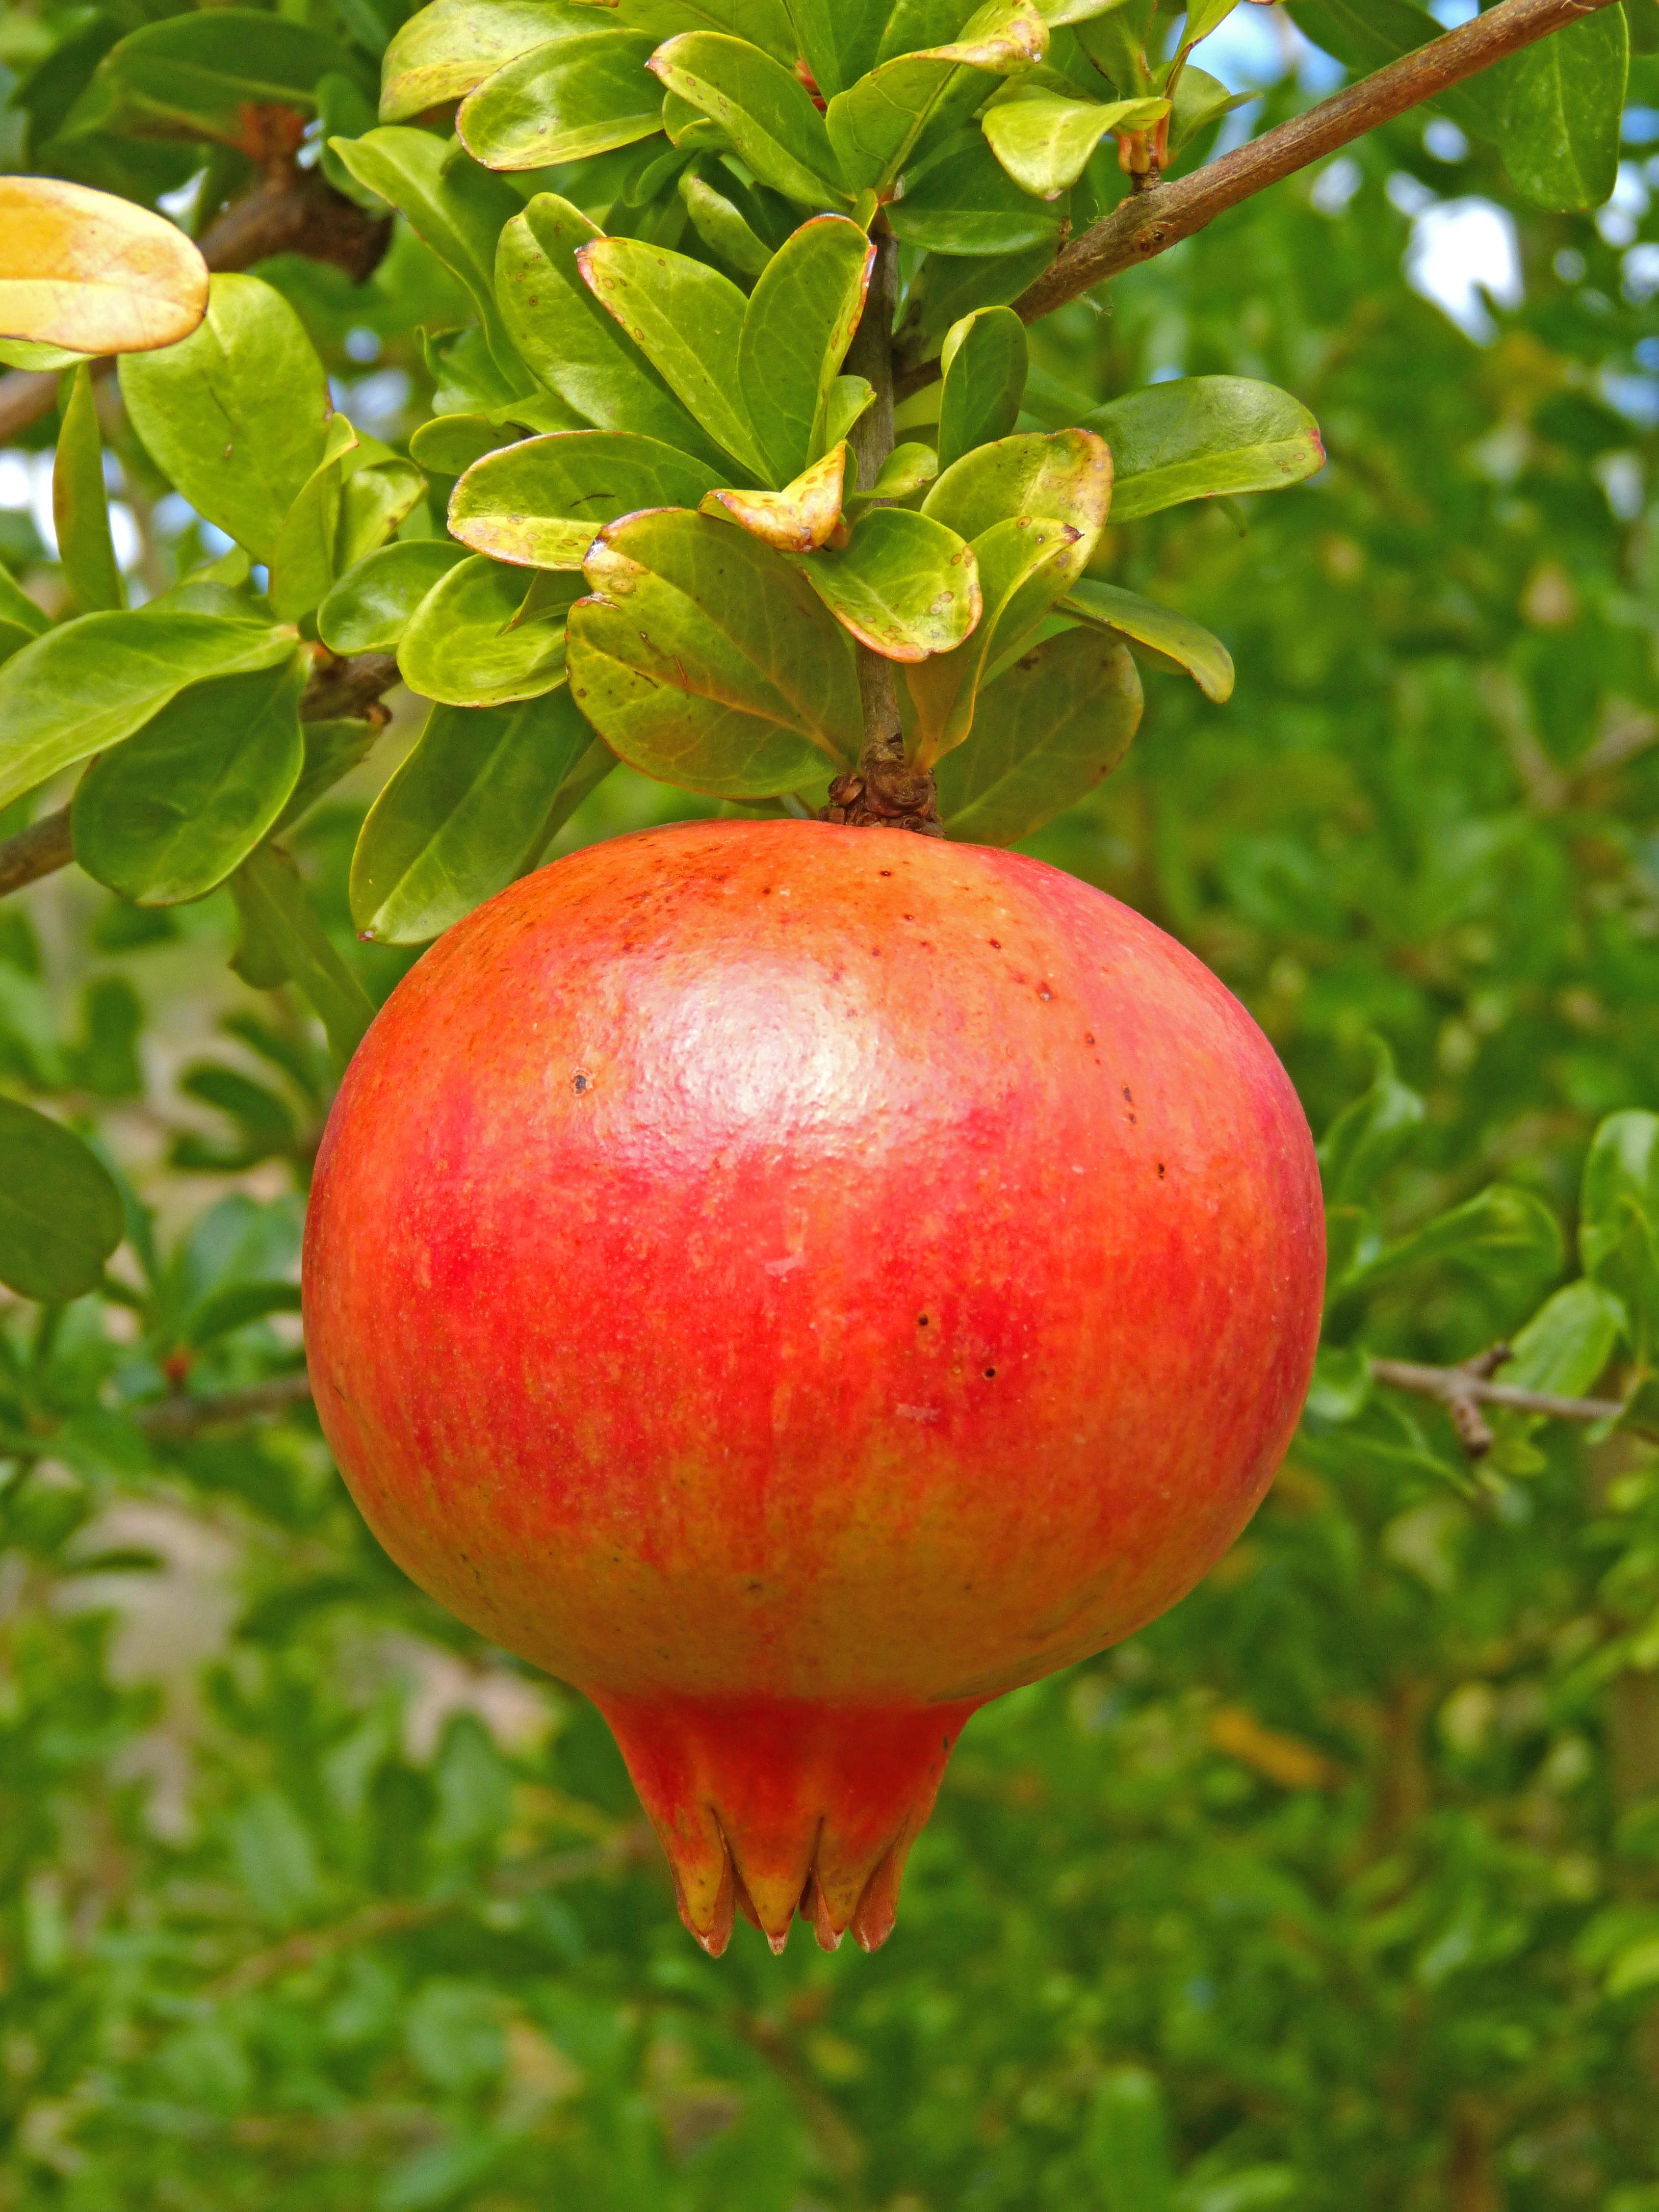 free images apple tree fruit flower orchard food harvest